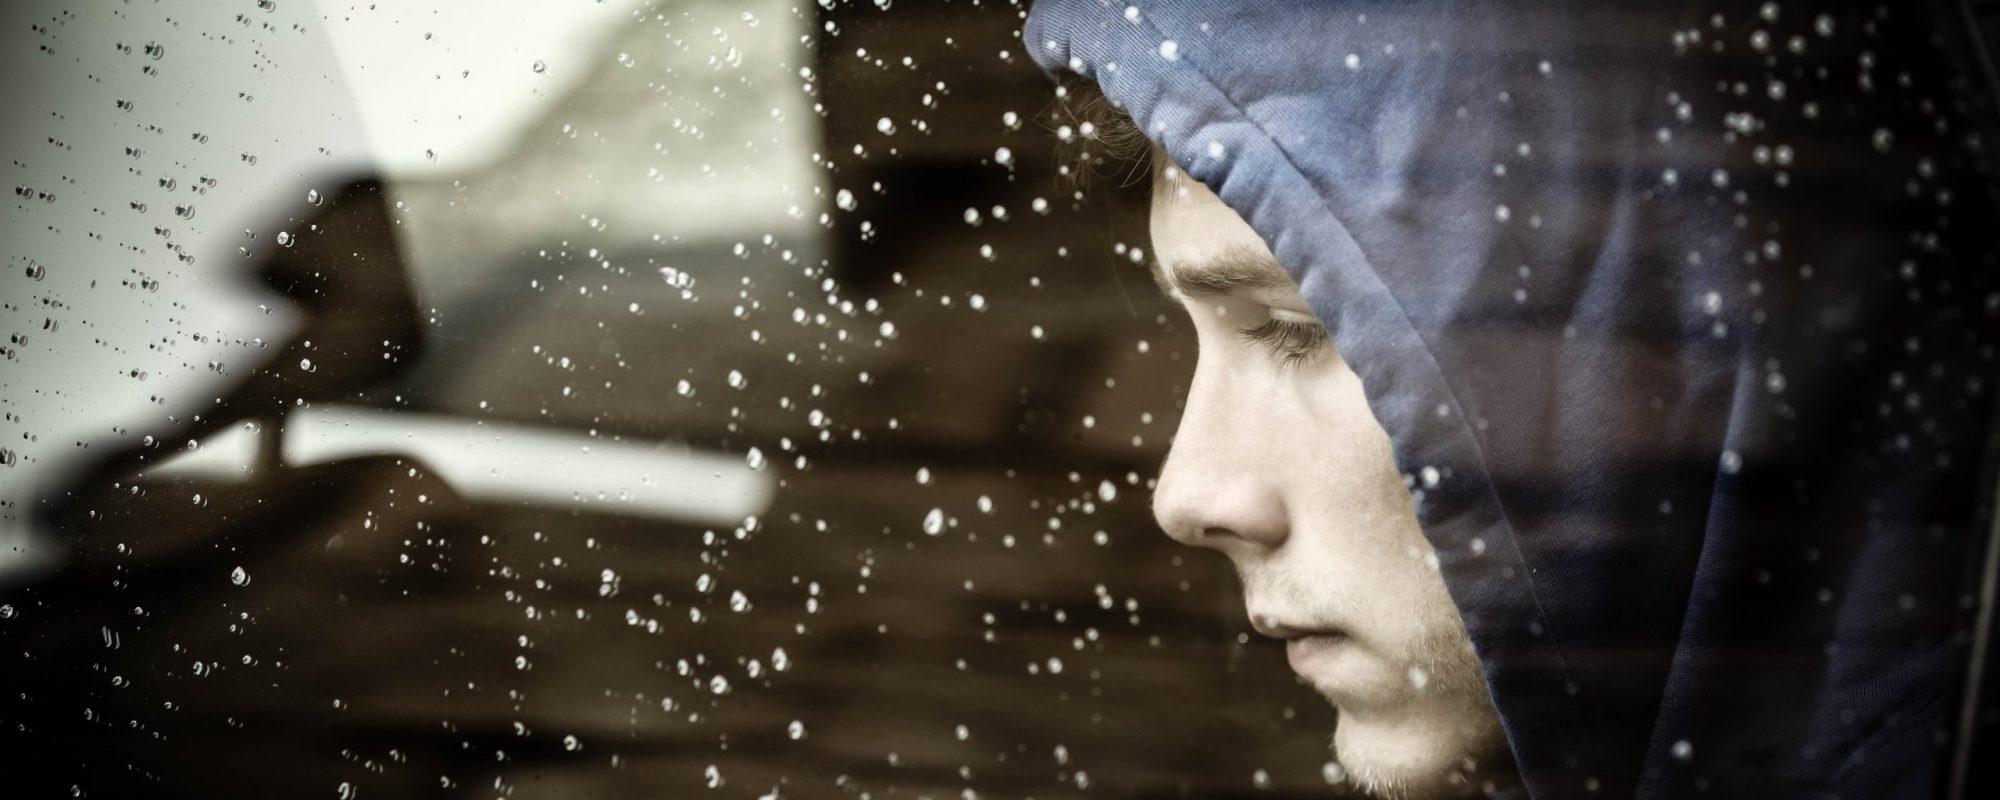 Sad teenager boy worried inside a car